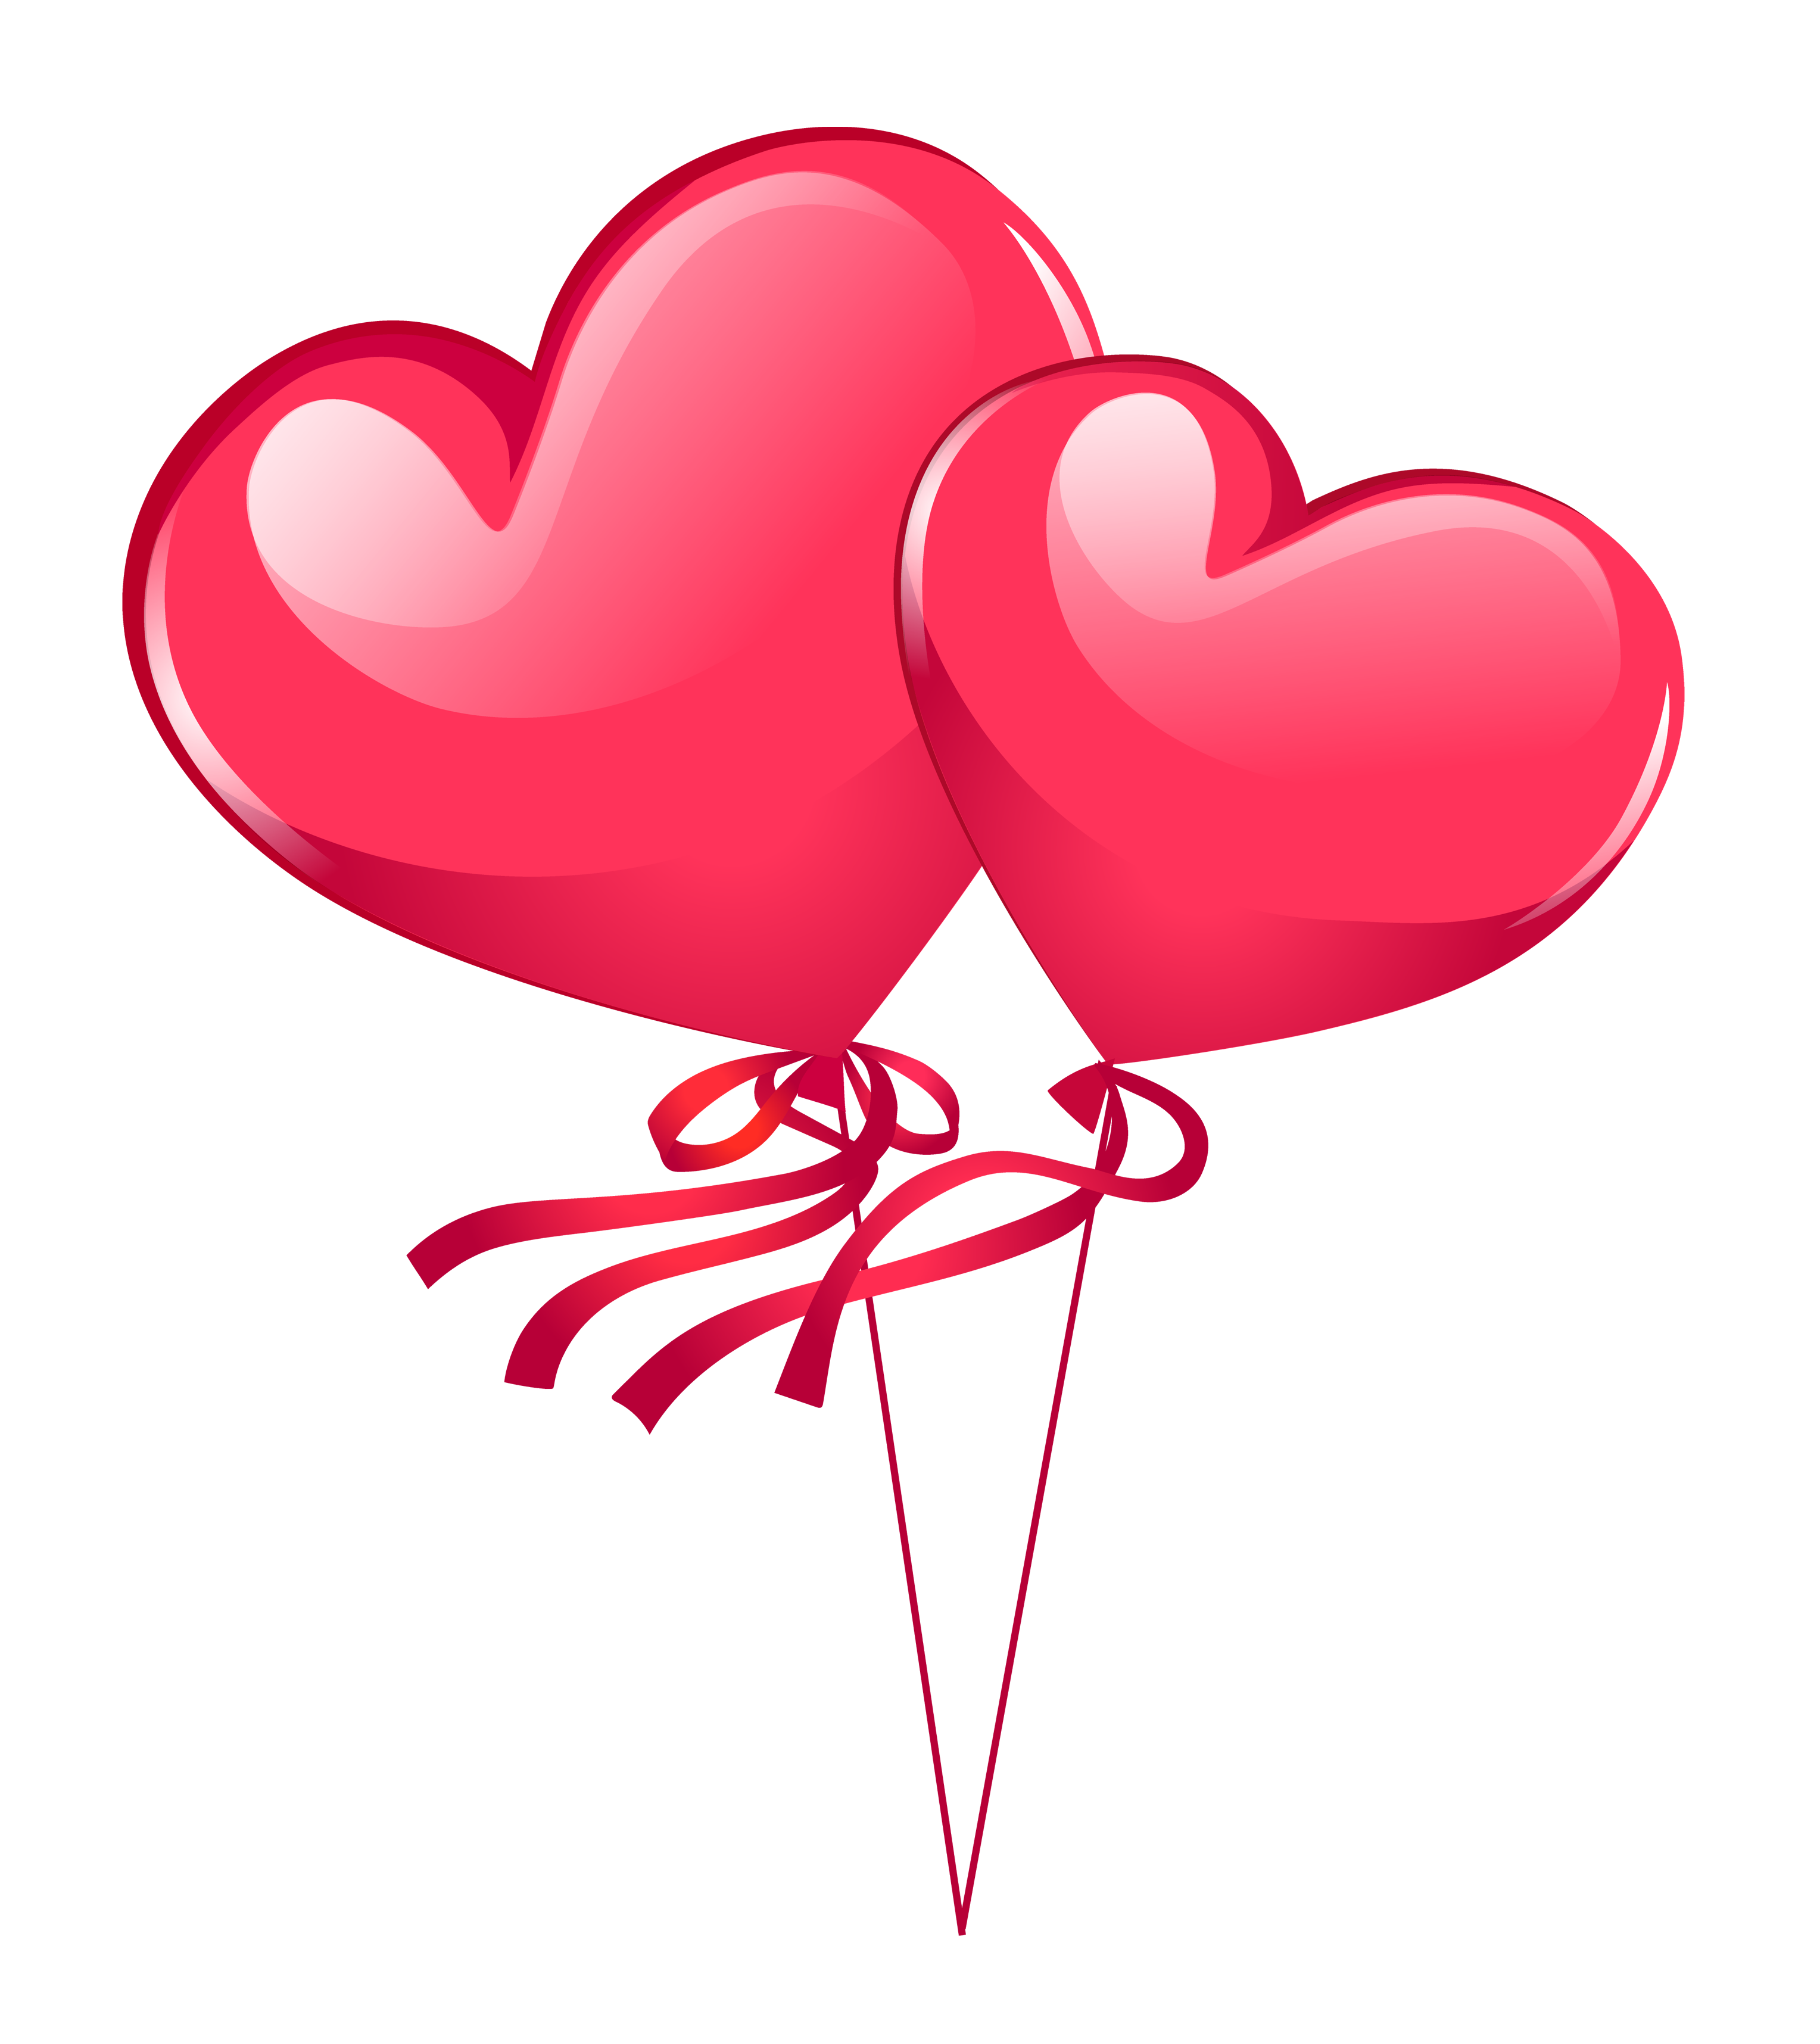 Clipart balloon wedding. Heart balloons png image